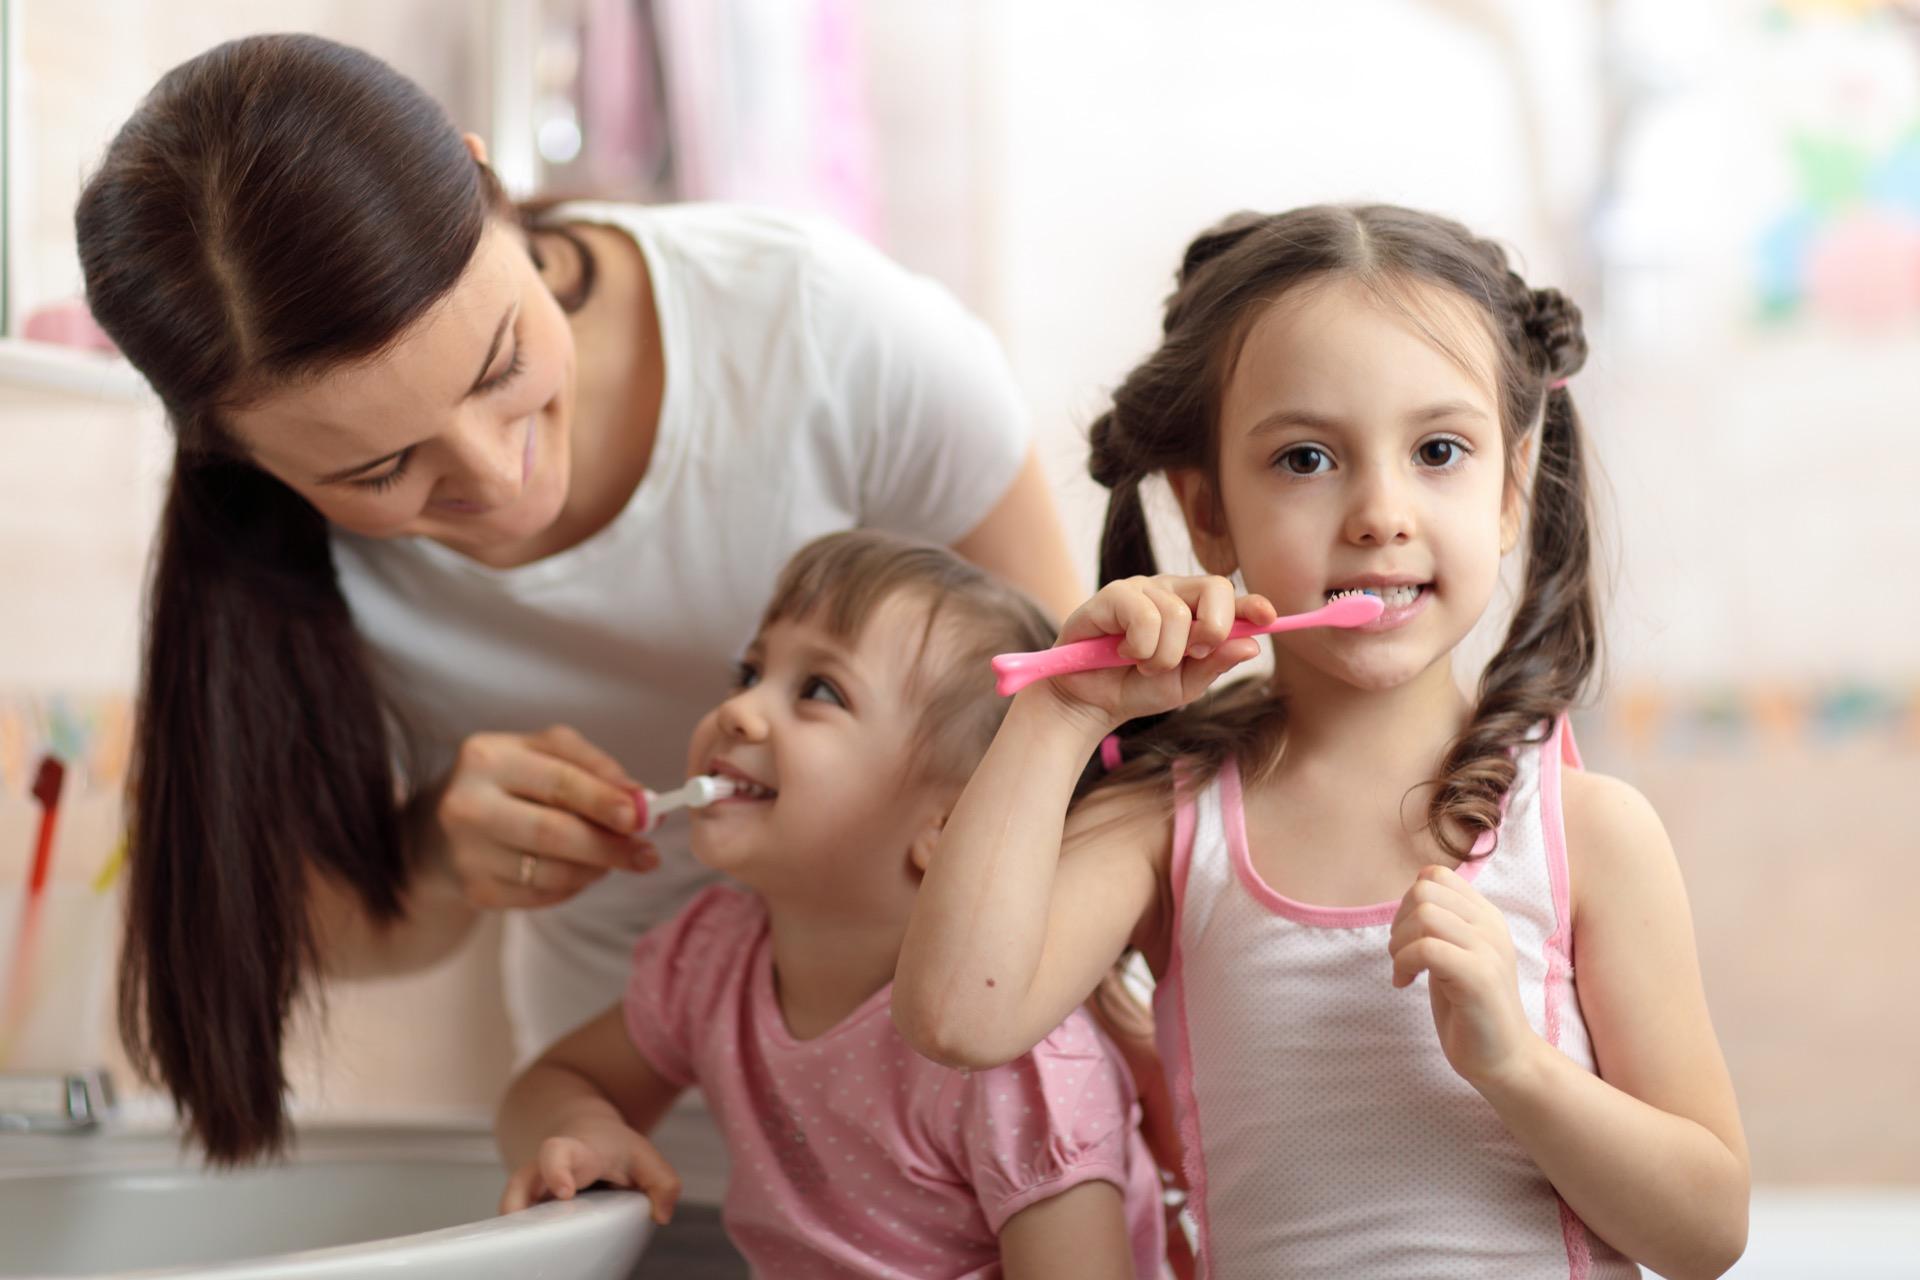 Parent teaching kids good oral hygiene